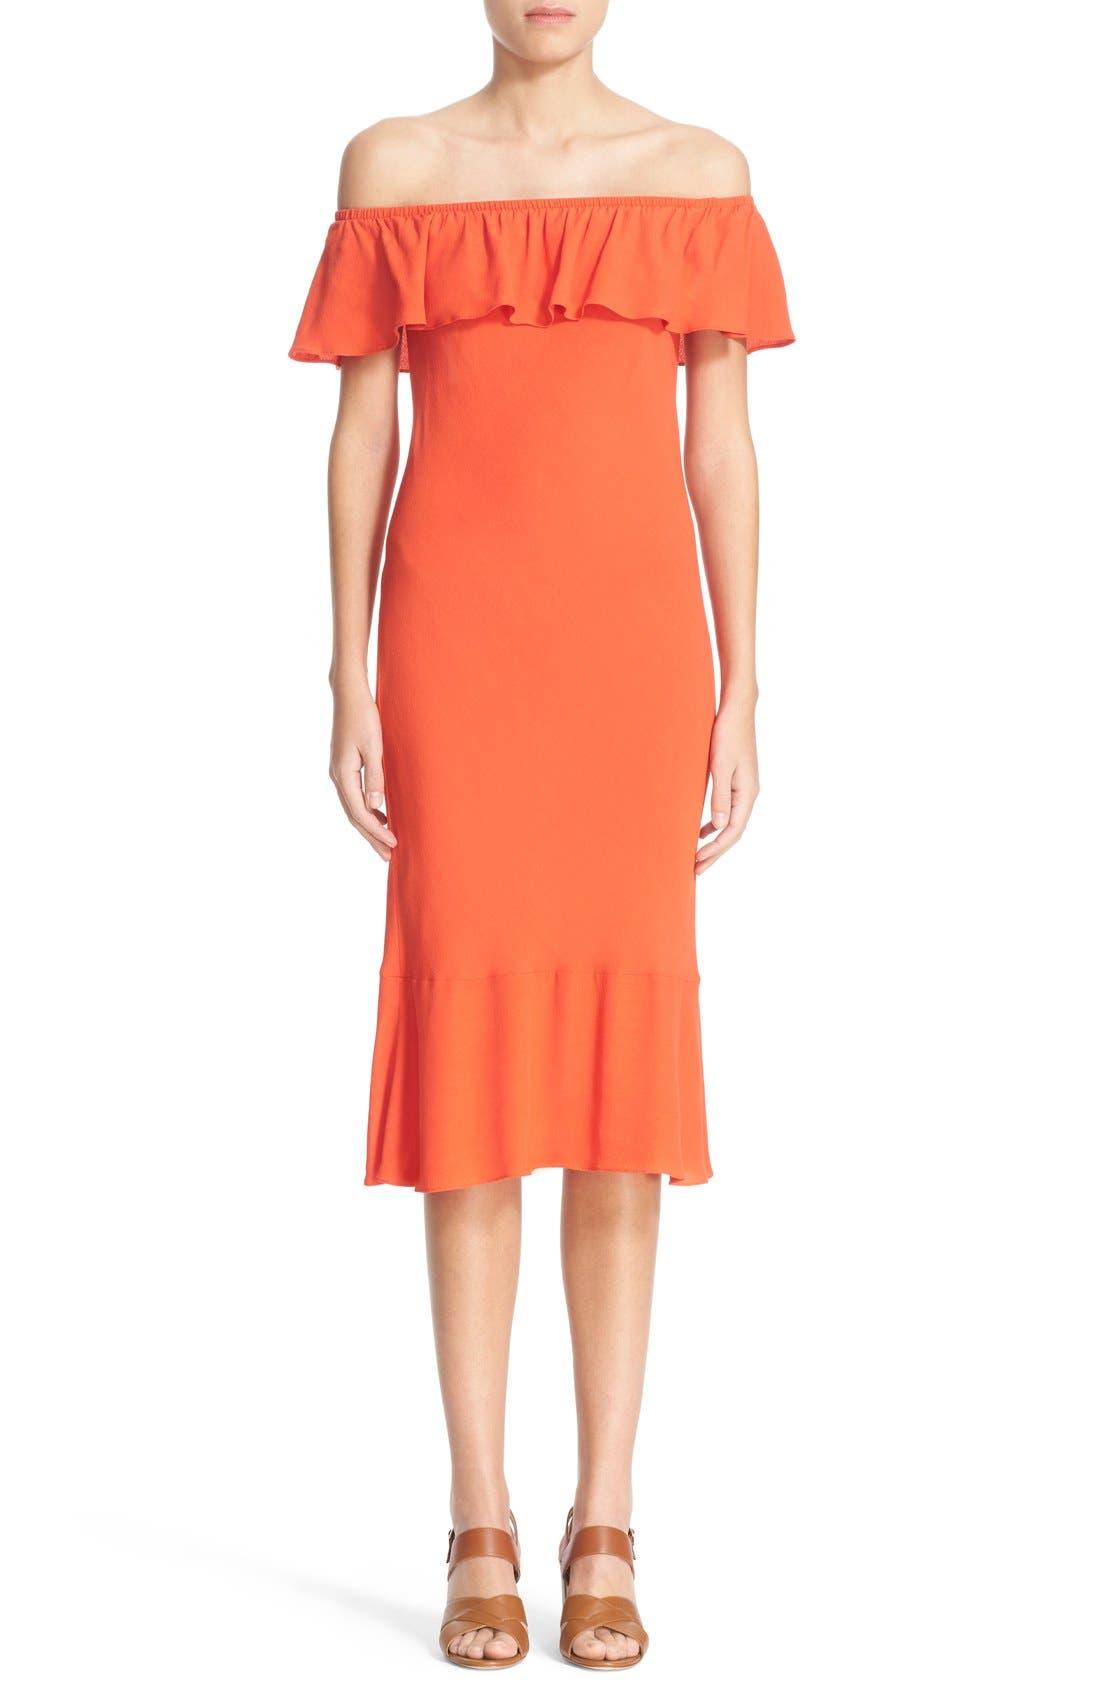 Alternate Image 1 Selected - Veronica Beard 'Oleta' Ruffle Off the Shoulder Dress